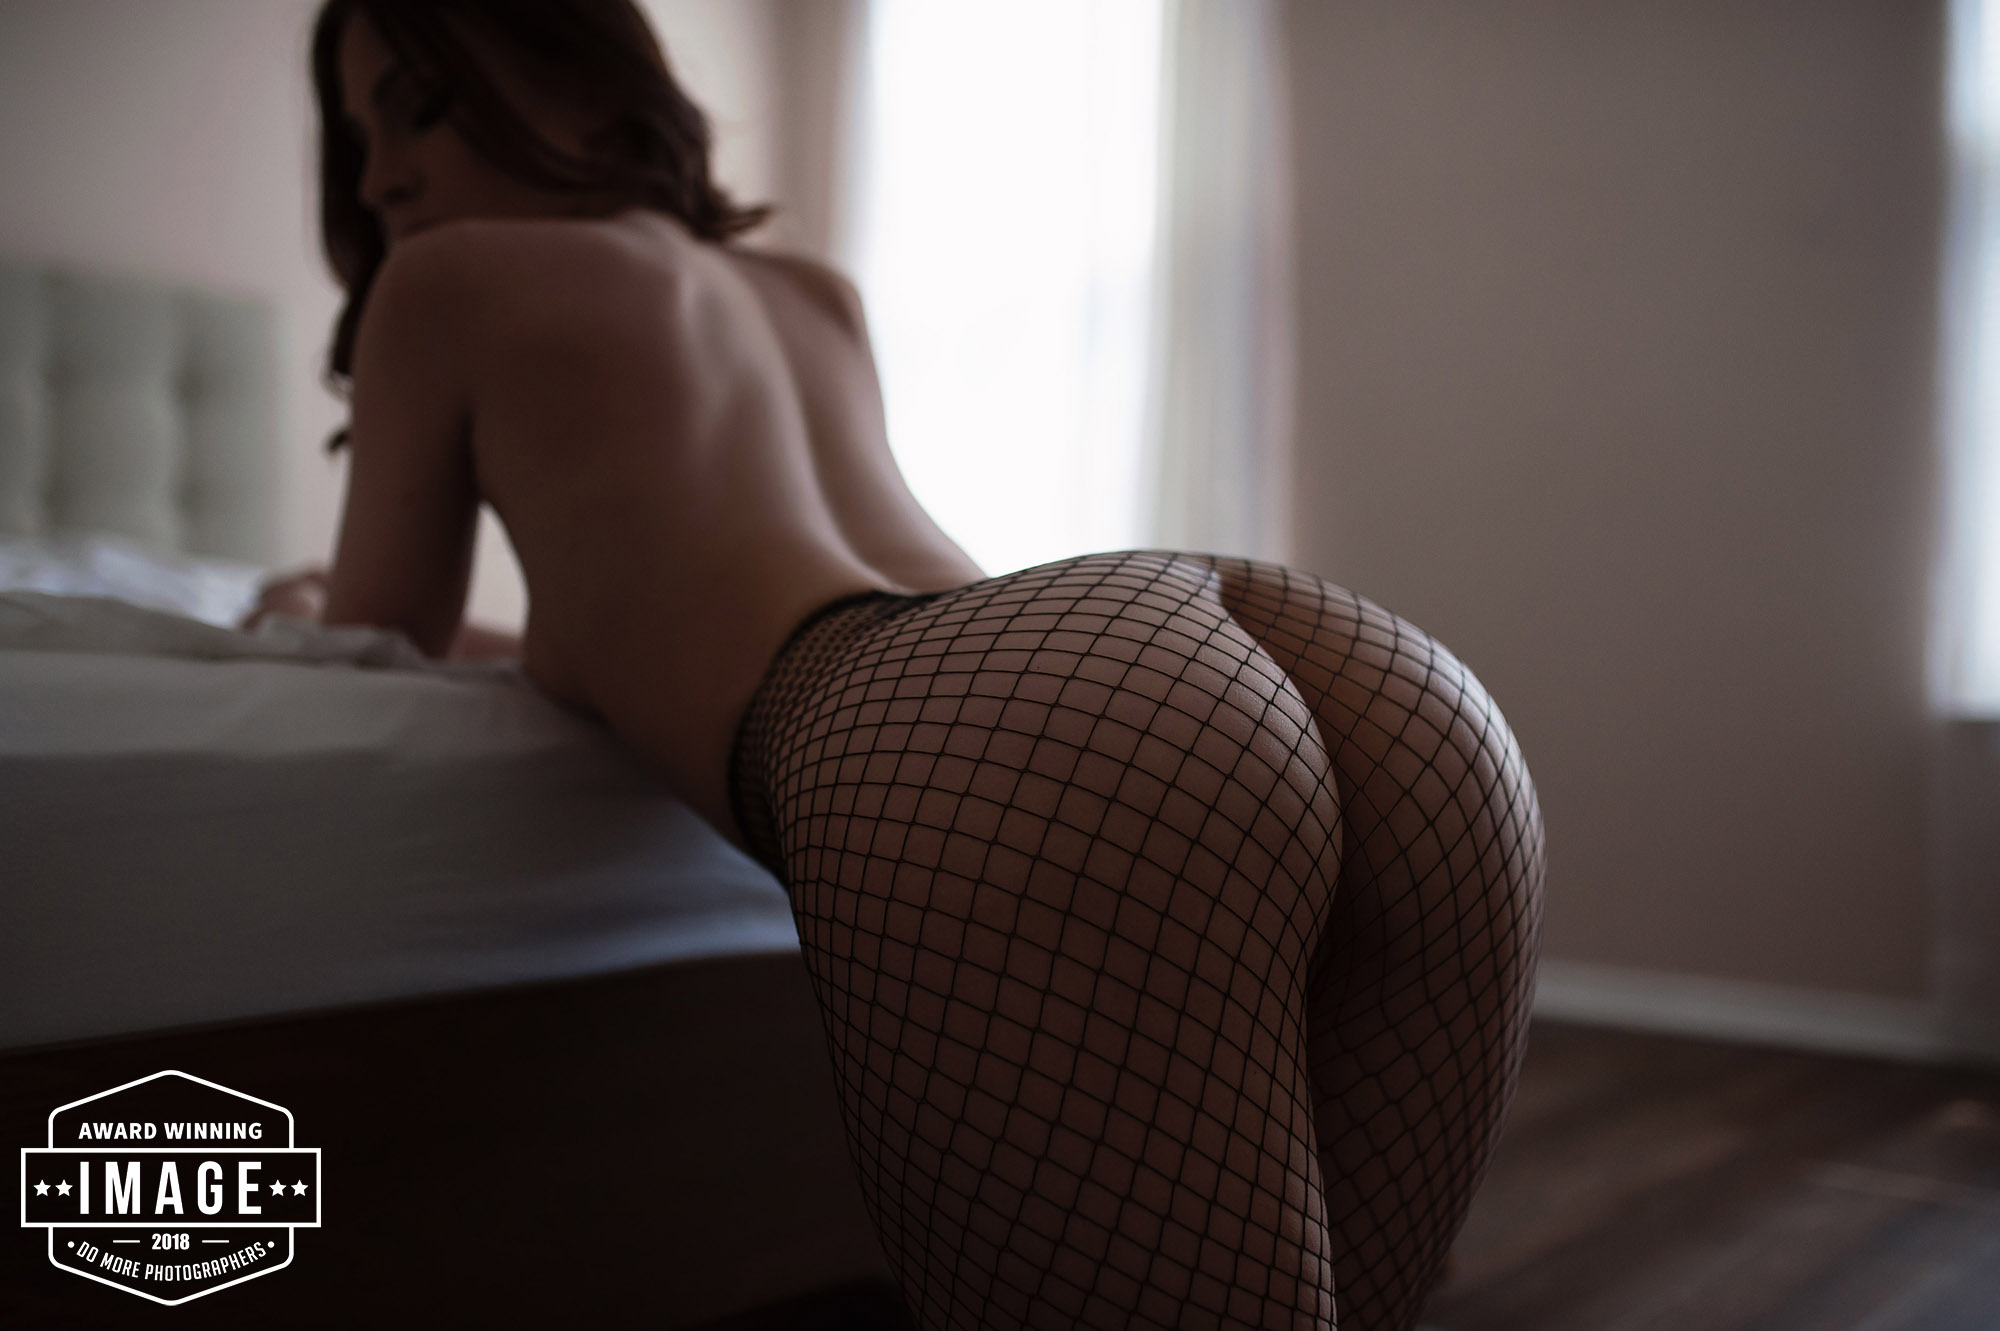 @karlamasonphotography